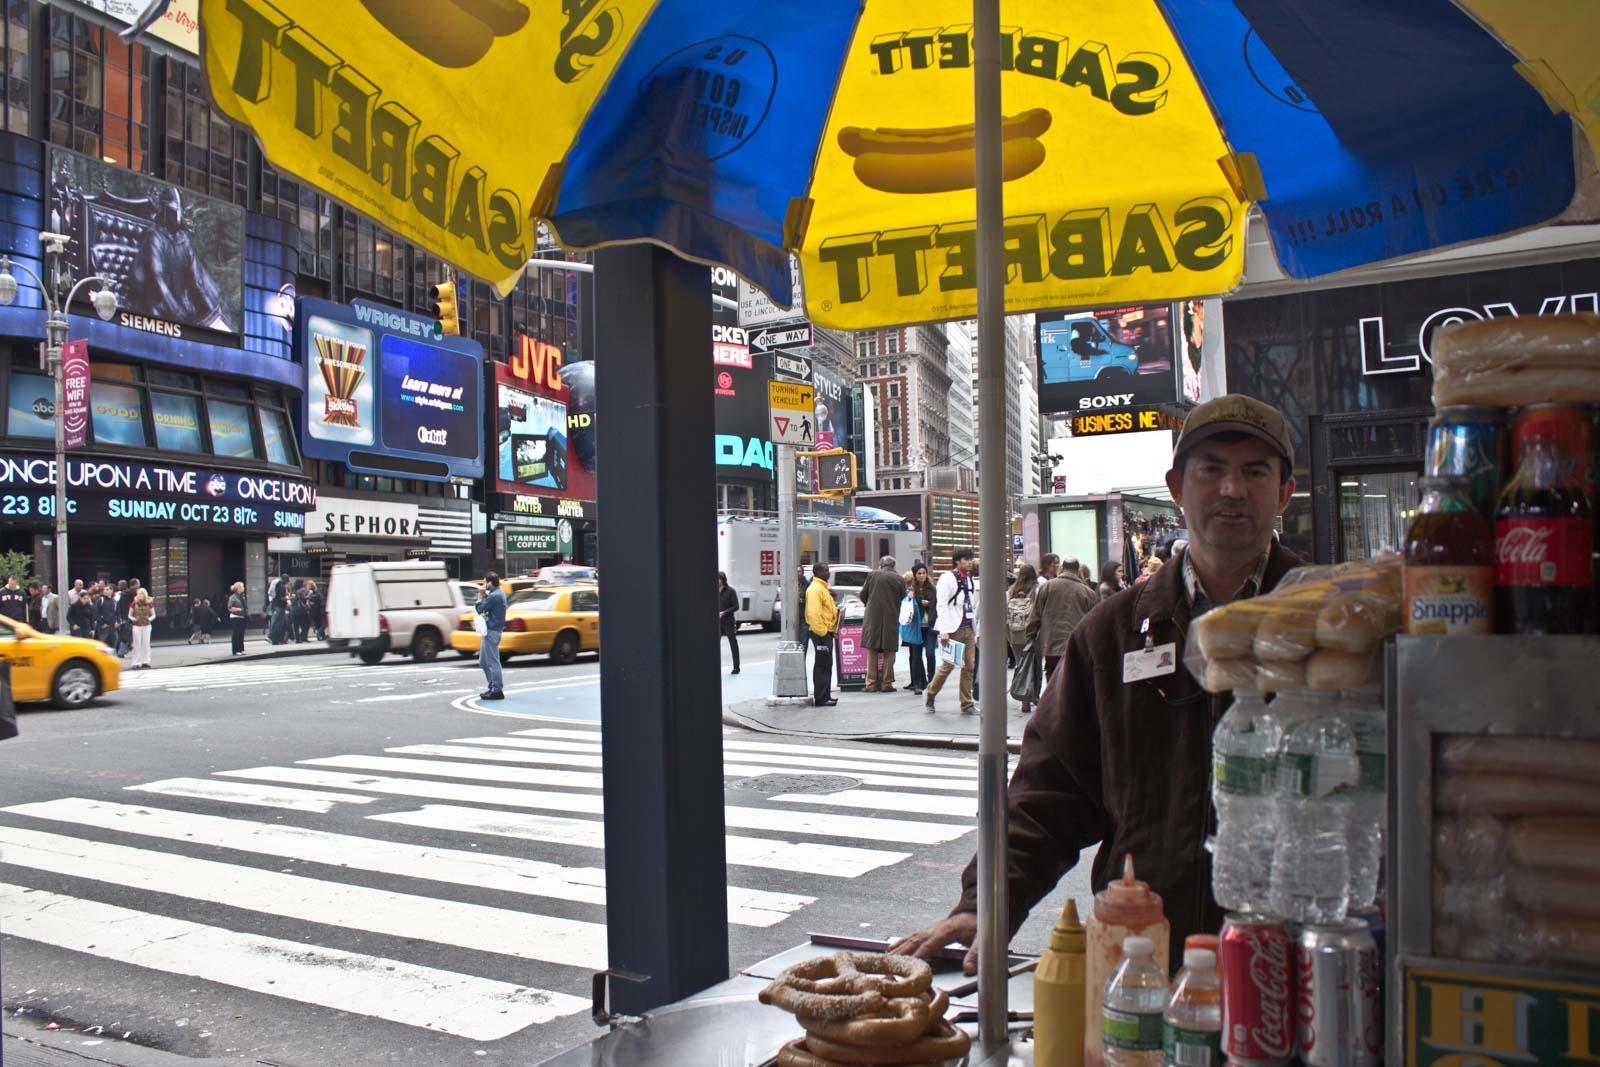 New York pretzel man in Times Square